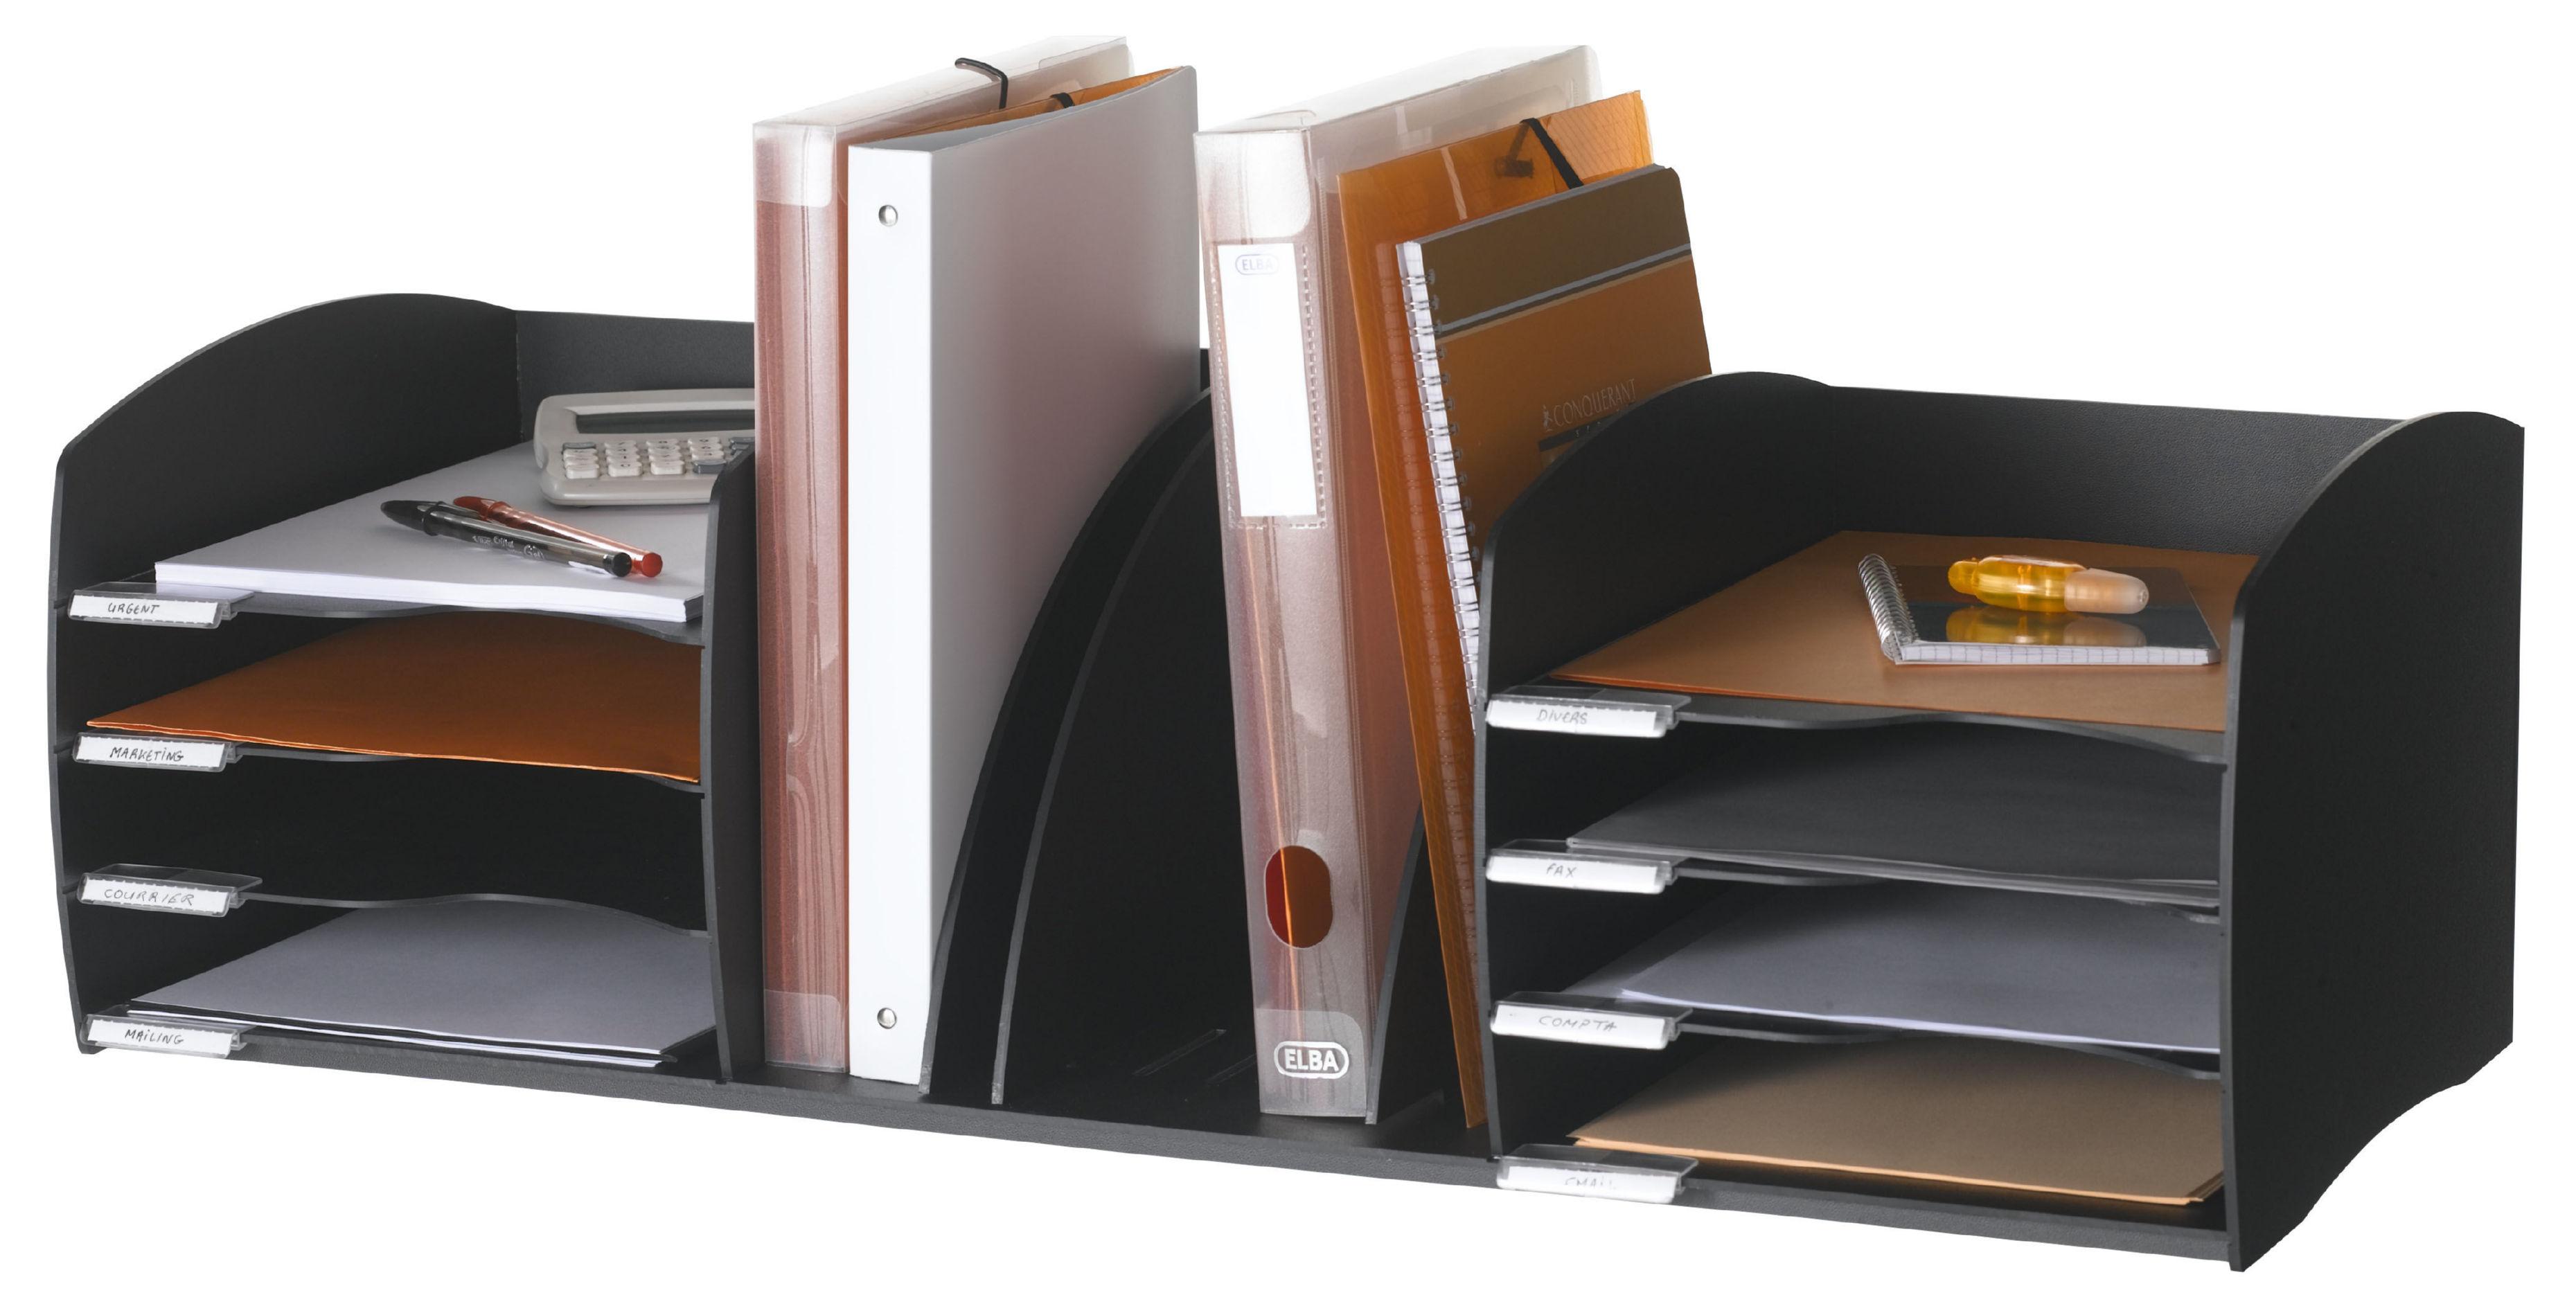 Desk Tidies Fast Paper Desktop Organizer 8 Comp Black